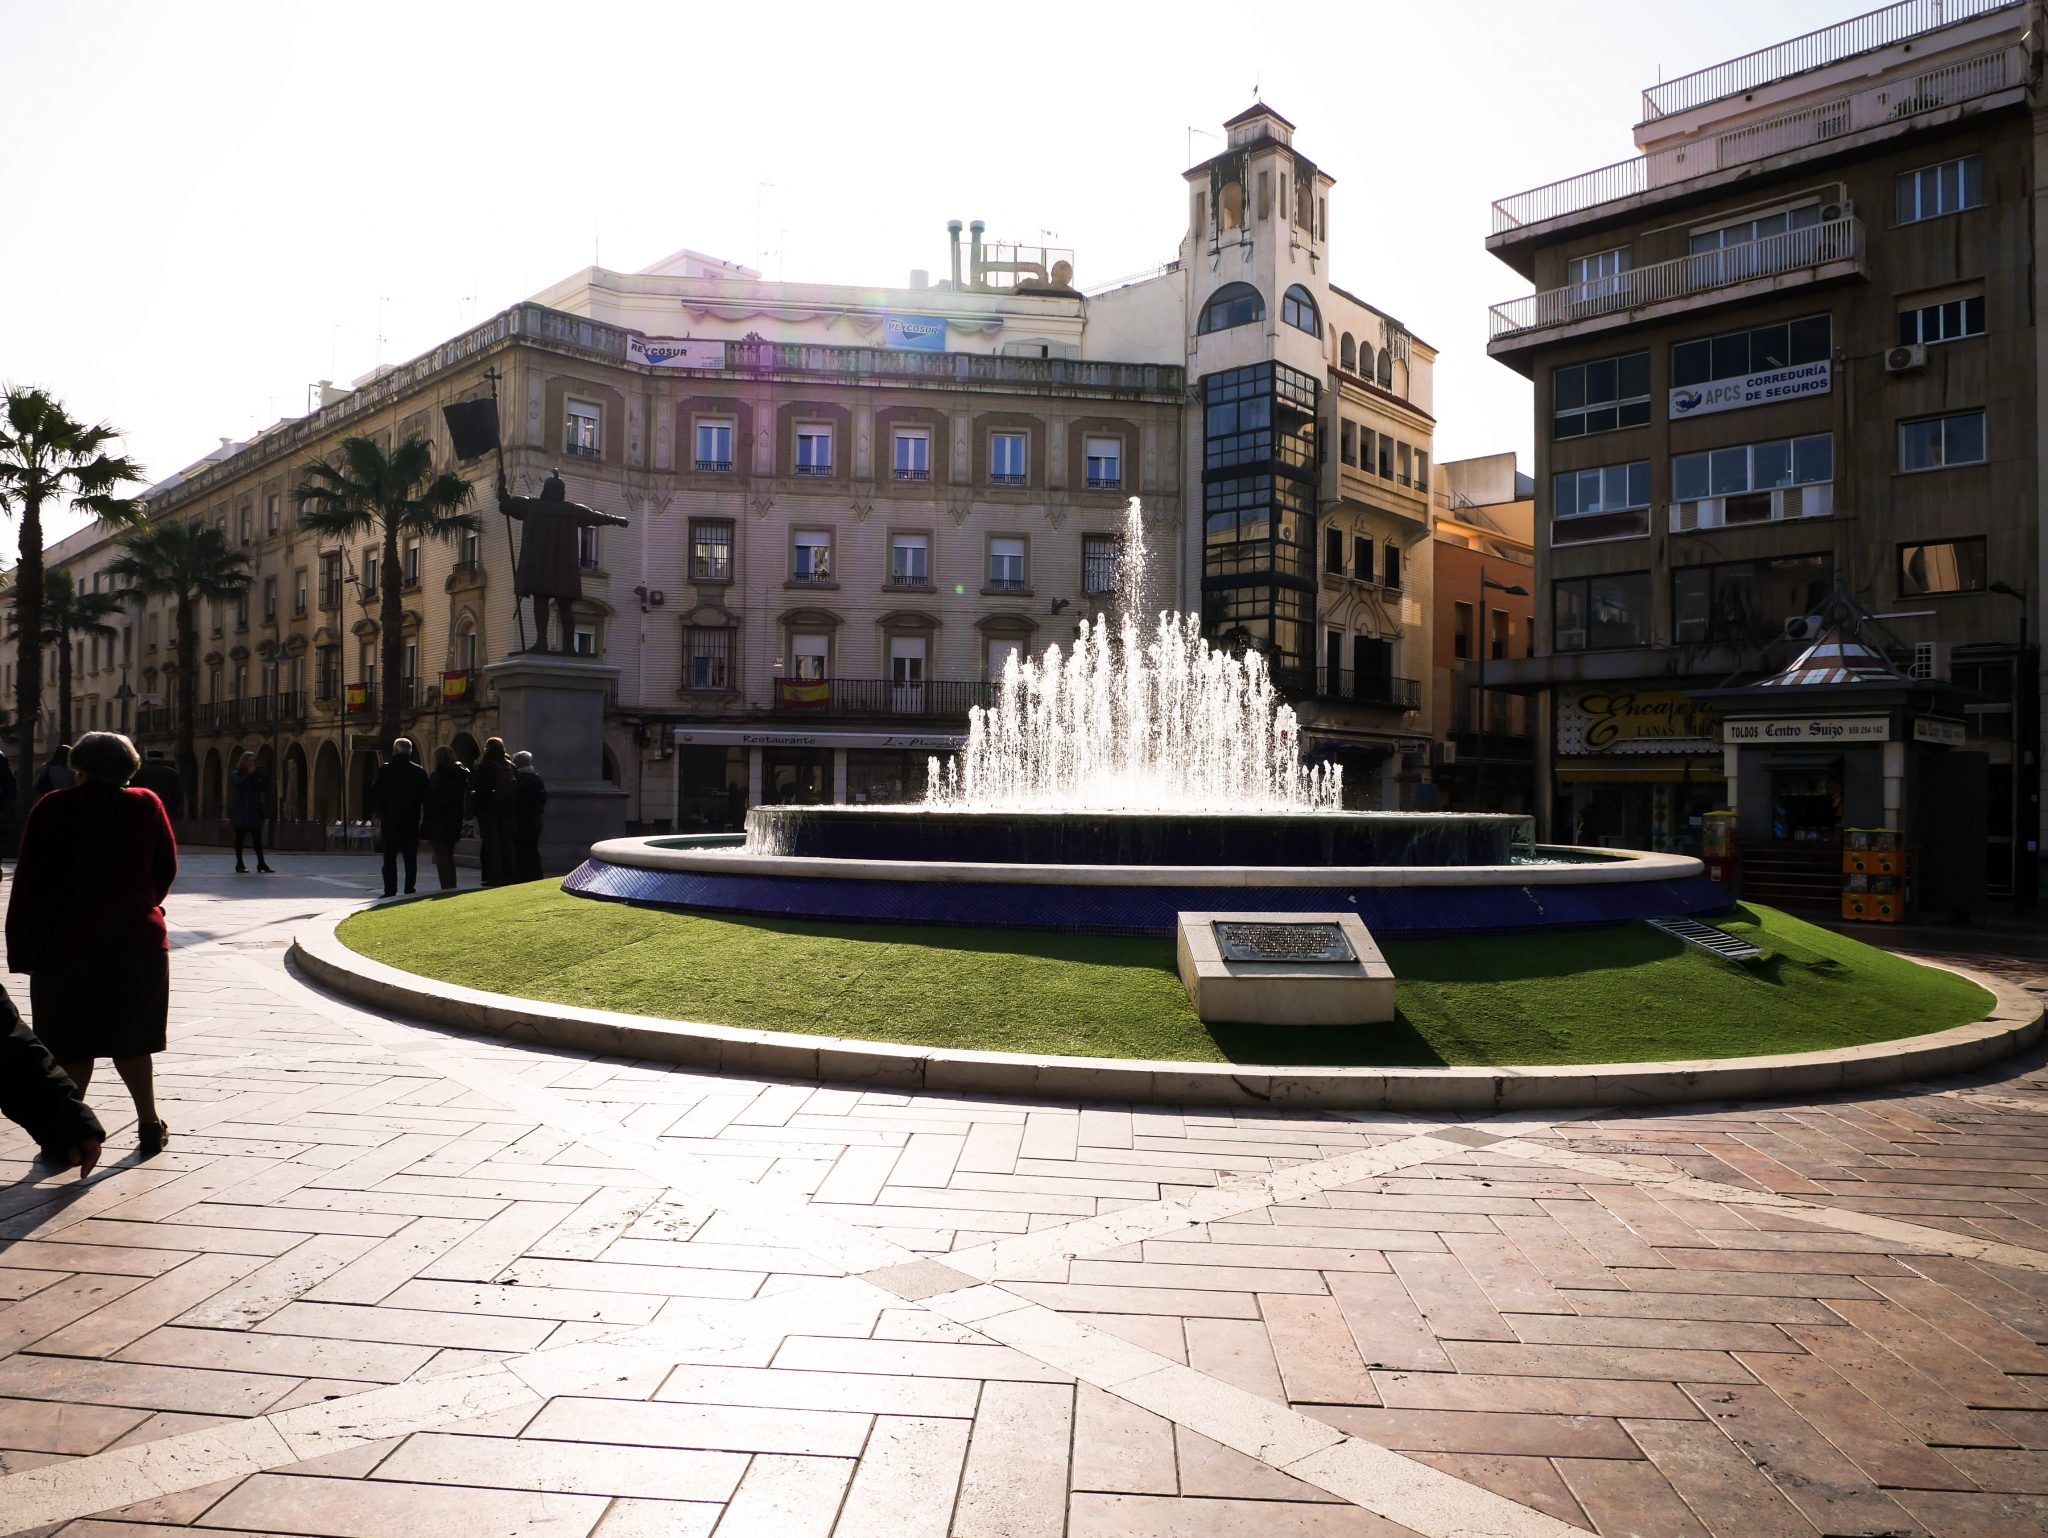 Huelva, Plaza de las Monjas: Die Kolumbus-Statue ist links vom Springbrunnen.